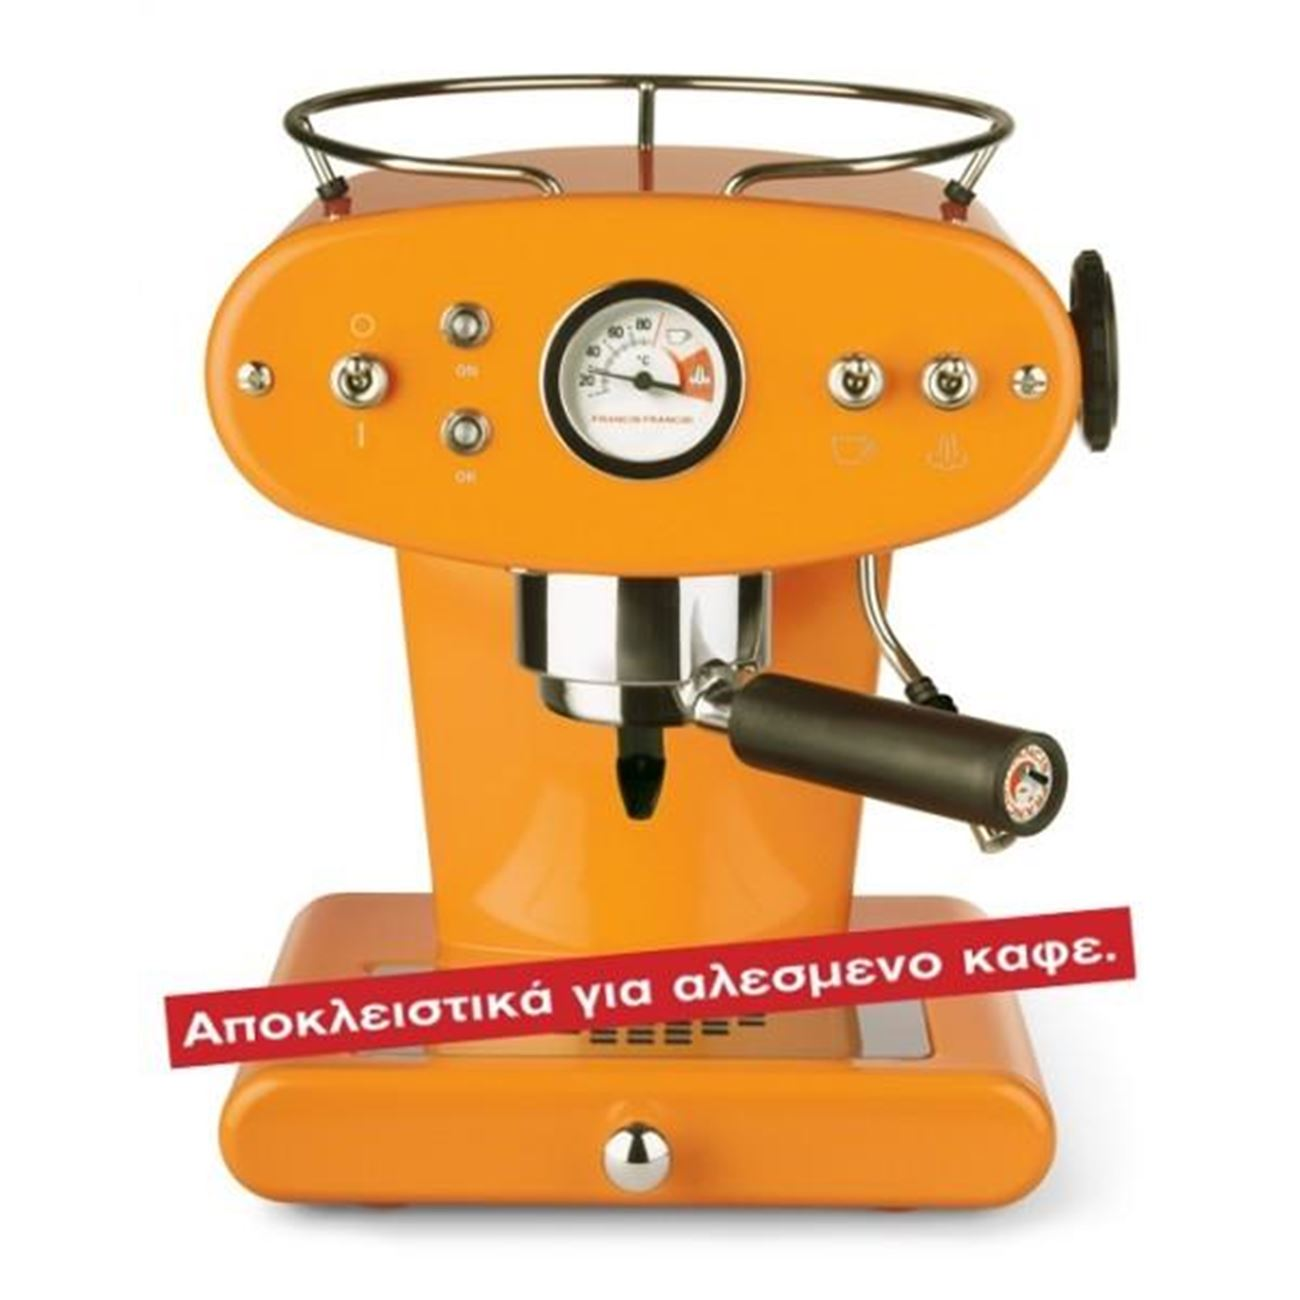 FRANCIS FRANCIS X1 ORANGE GROUND COFFEE